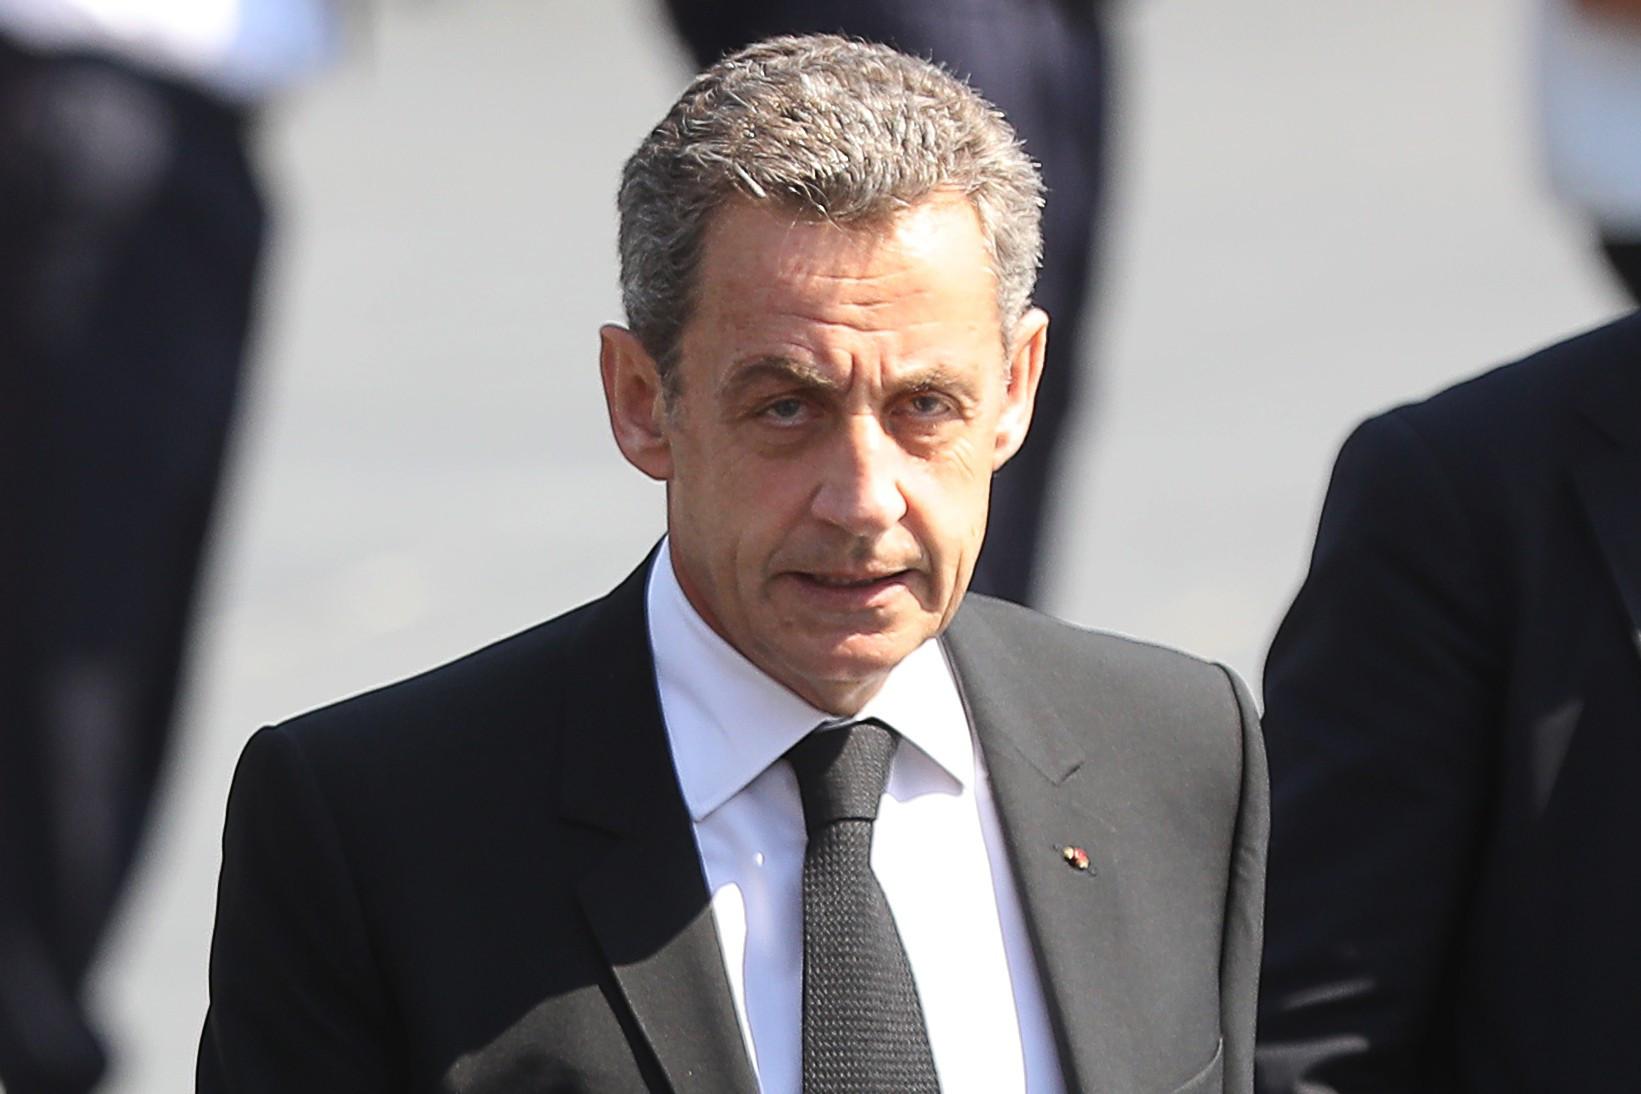 Former French President Sarkozy dragged into criminal probe into Qatar 2022 bid